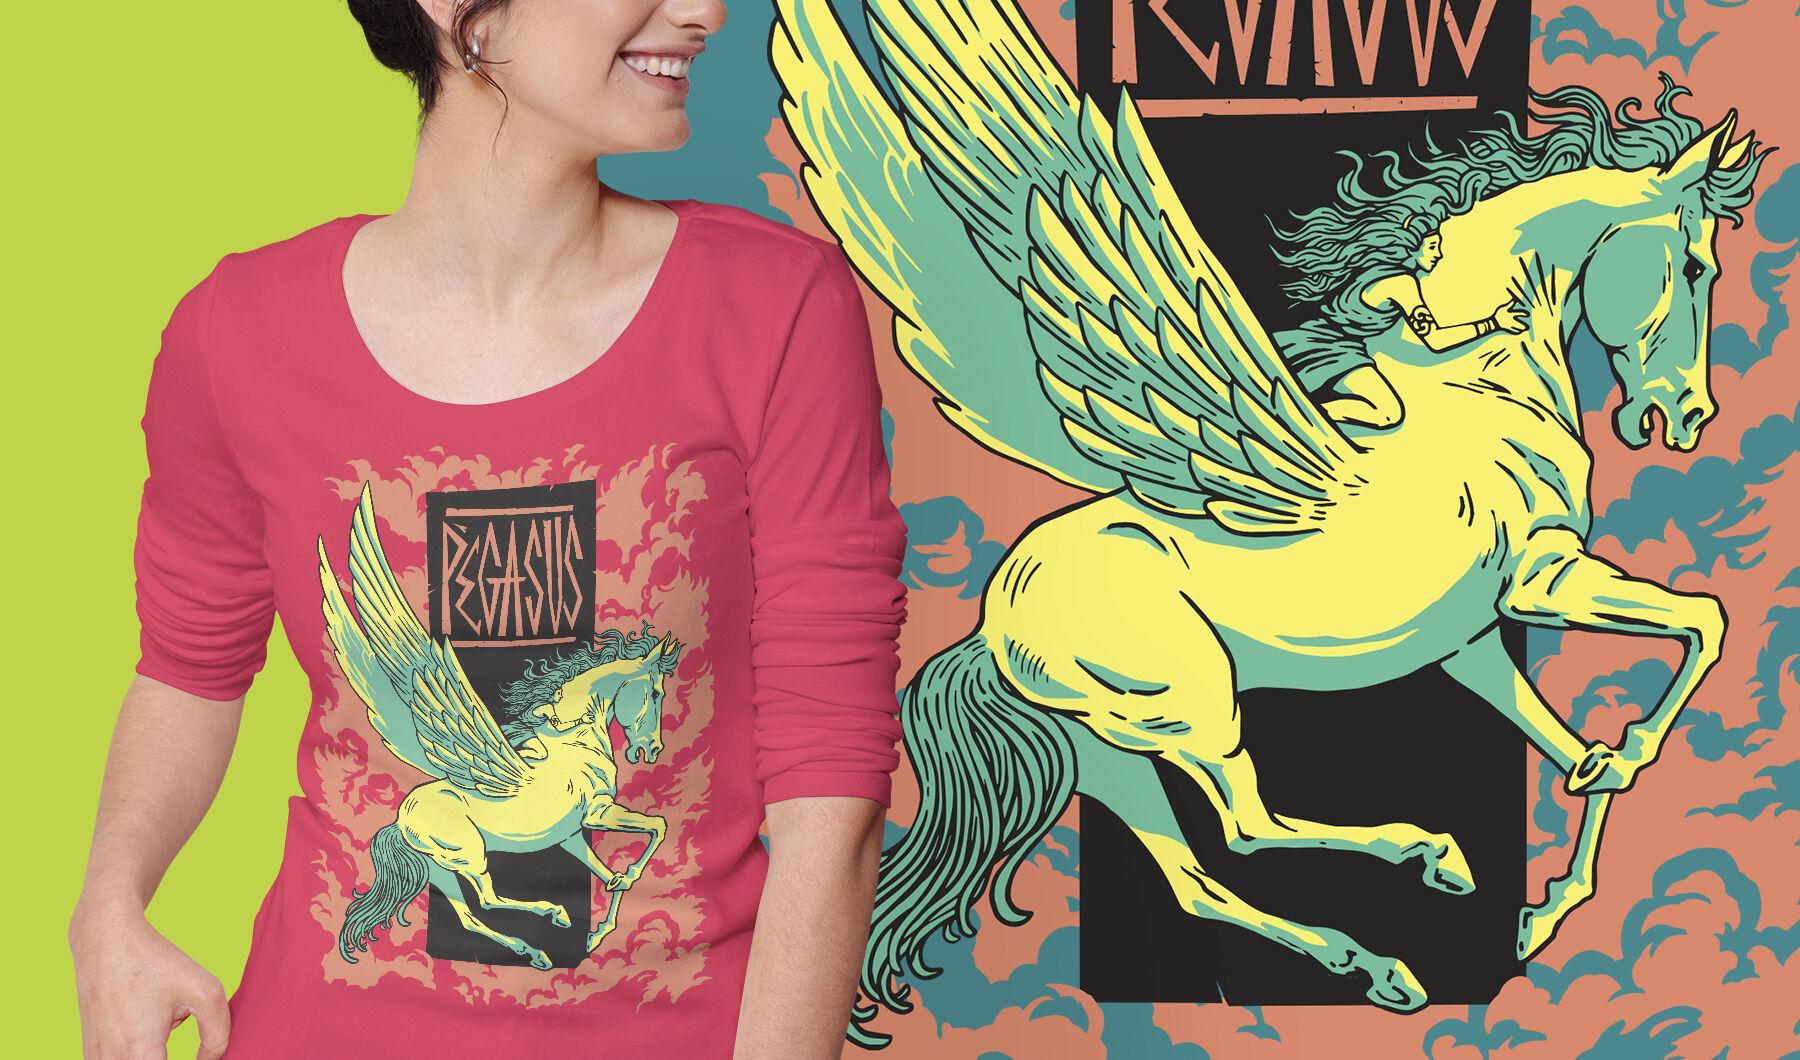 Pegasus mythical greece t-shirt design